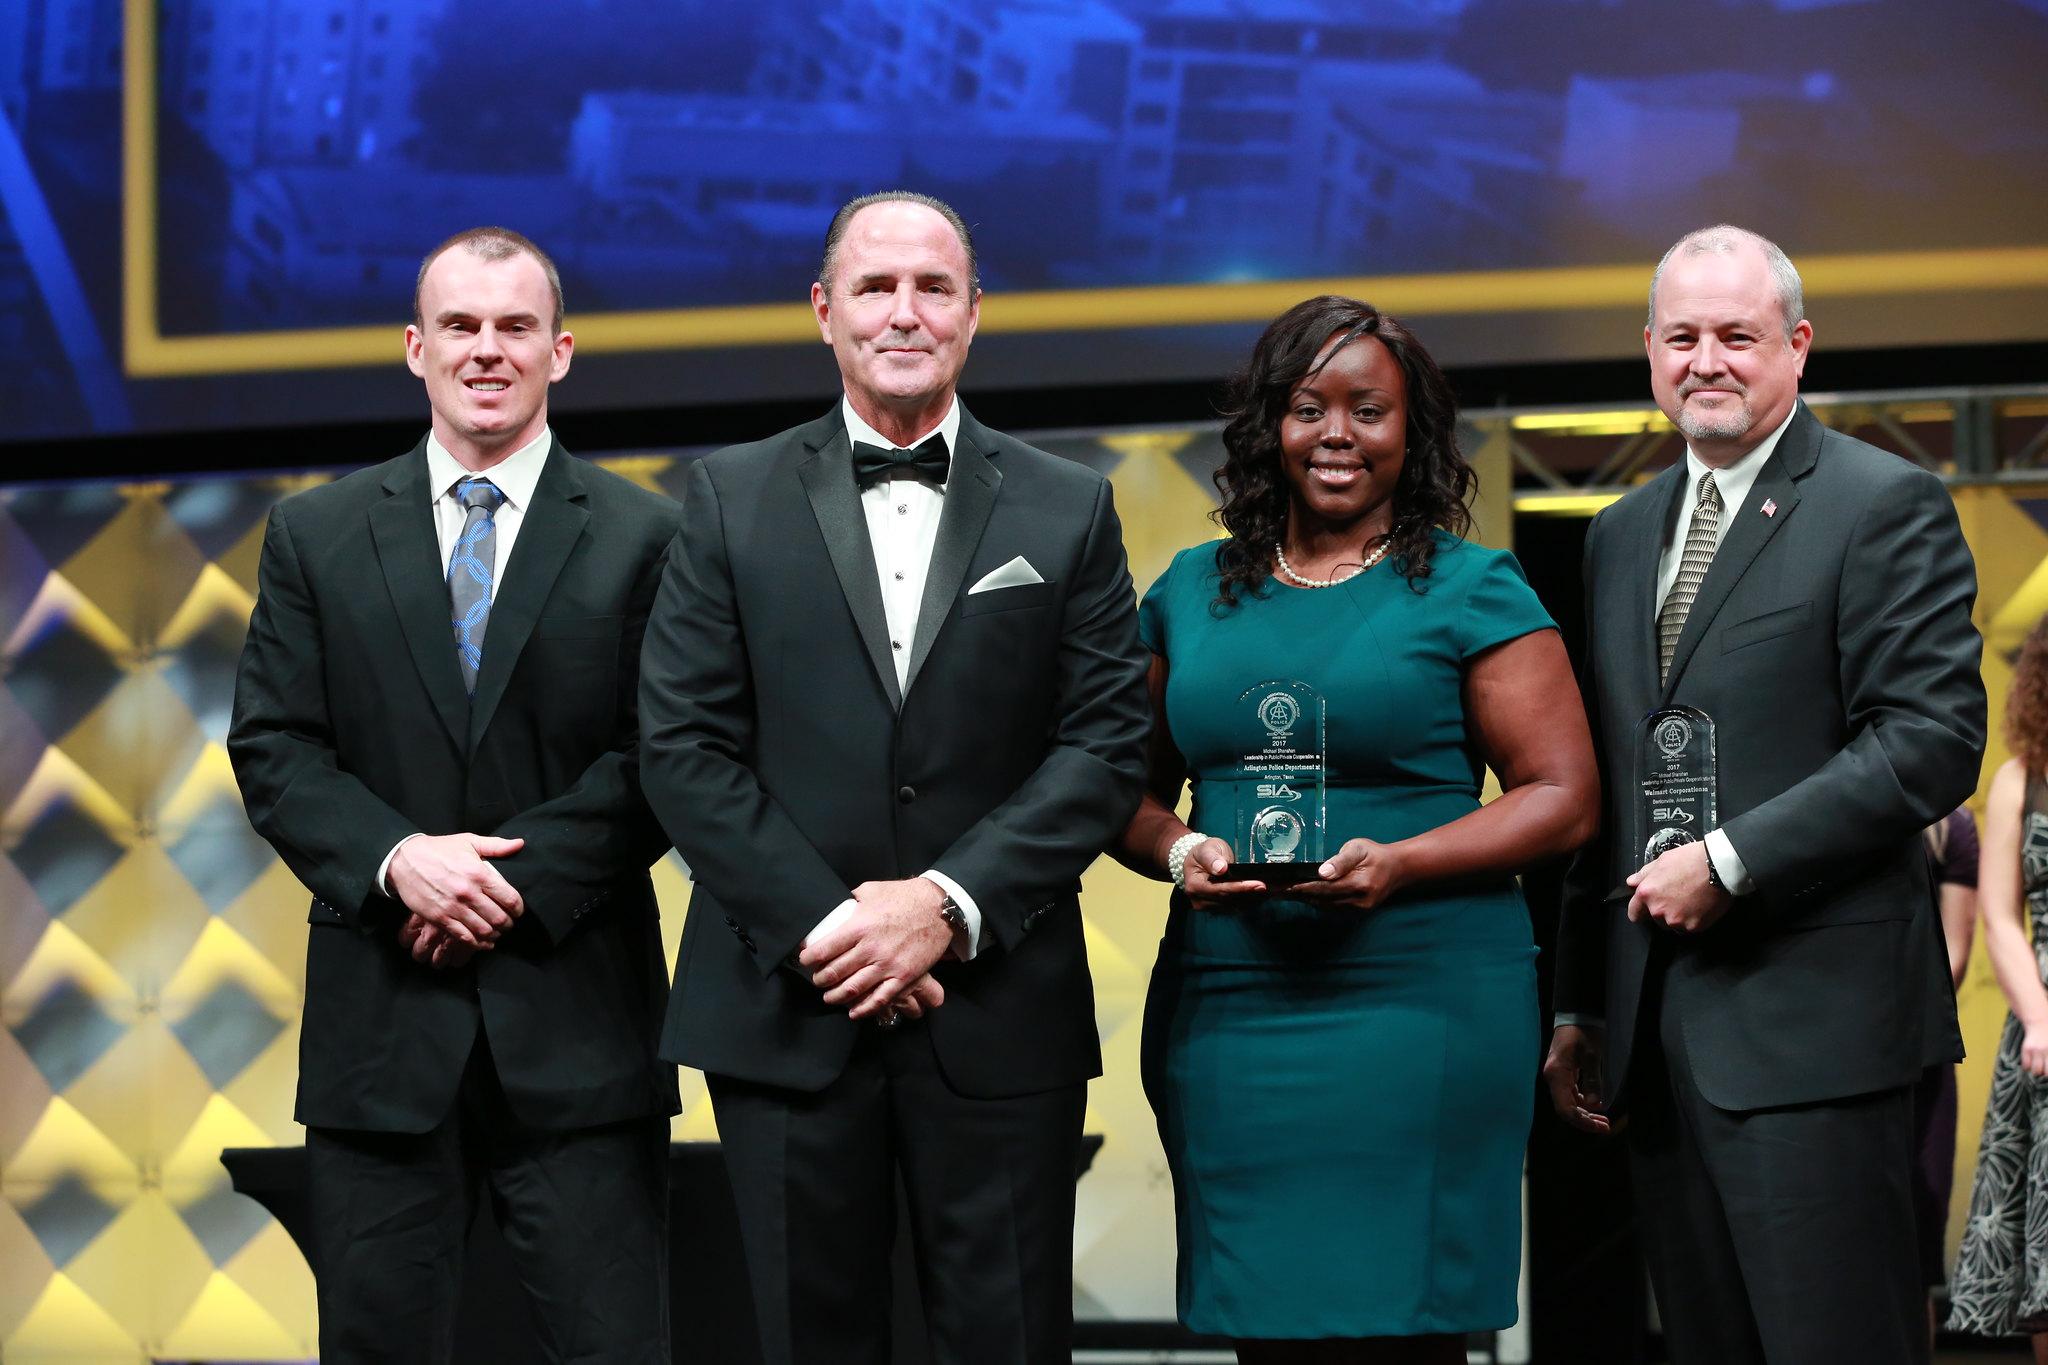 IACP Michael Shanahan Leadership in PublicPrivate Cooperation Award - Arlington and Walmart